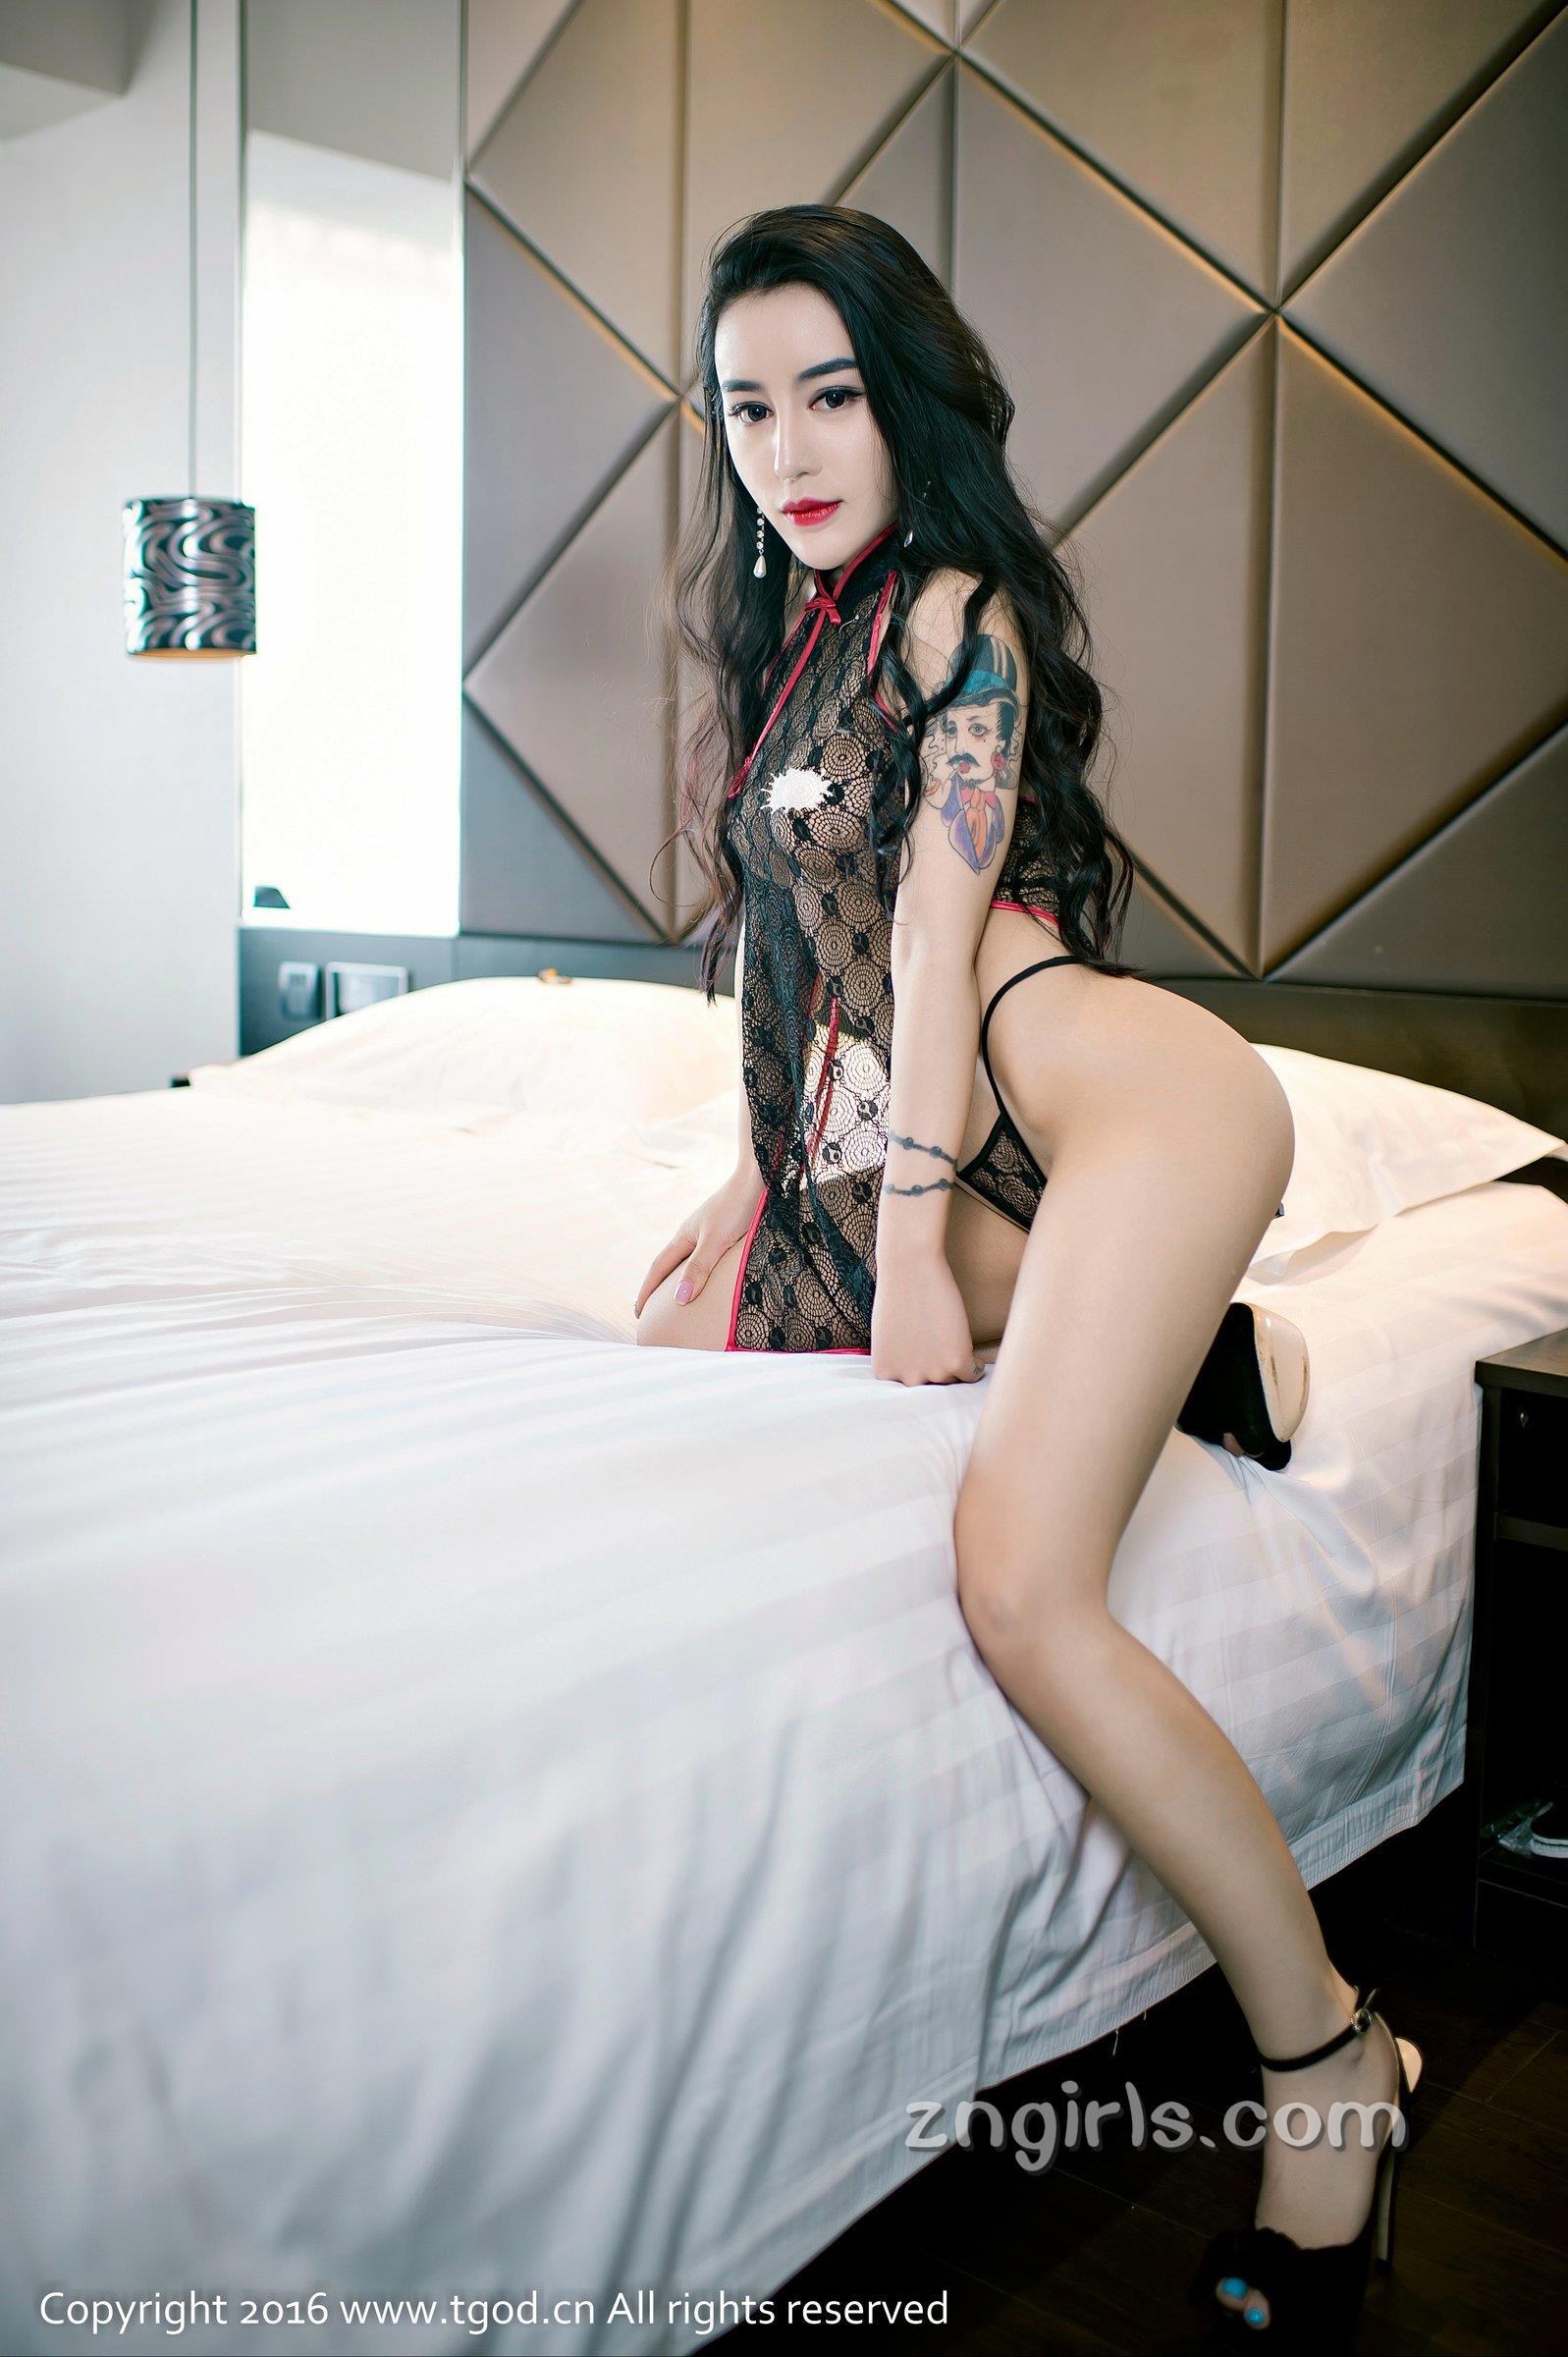 【TGOD】推女神陆梓琪babe翘臀丰胸冷艳美之美女禁处受辱